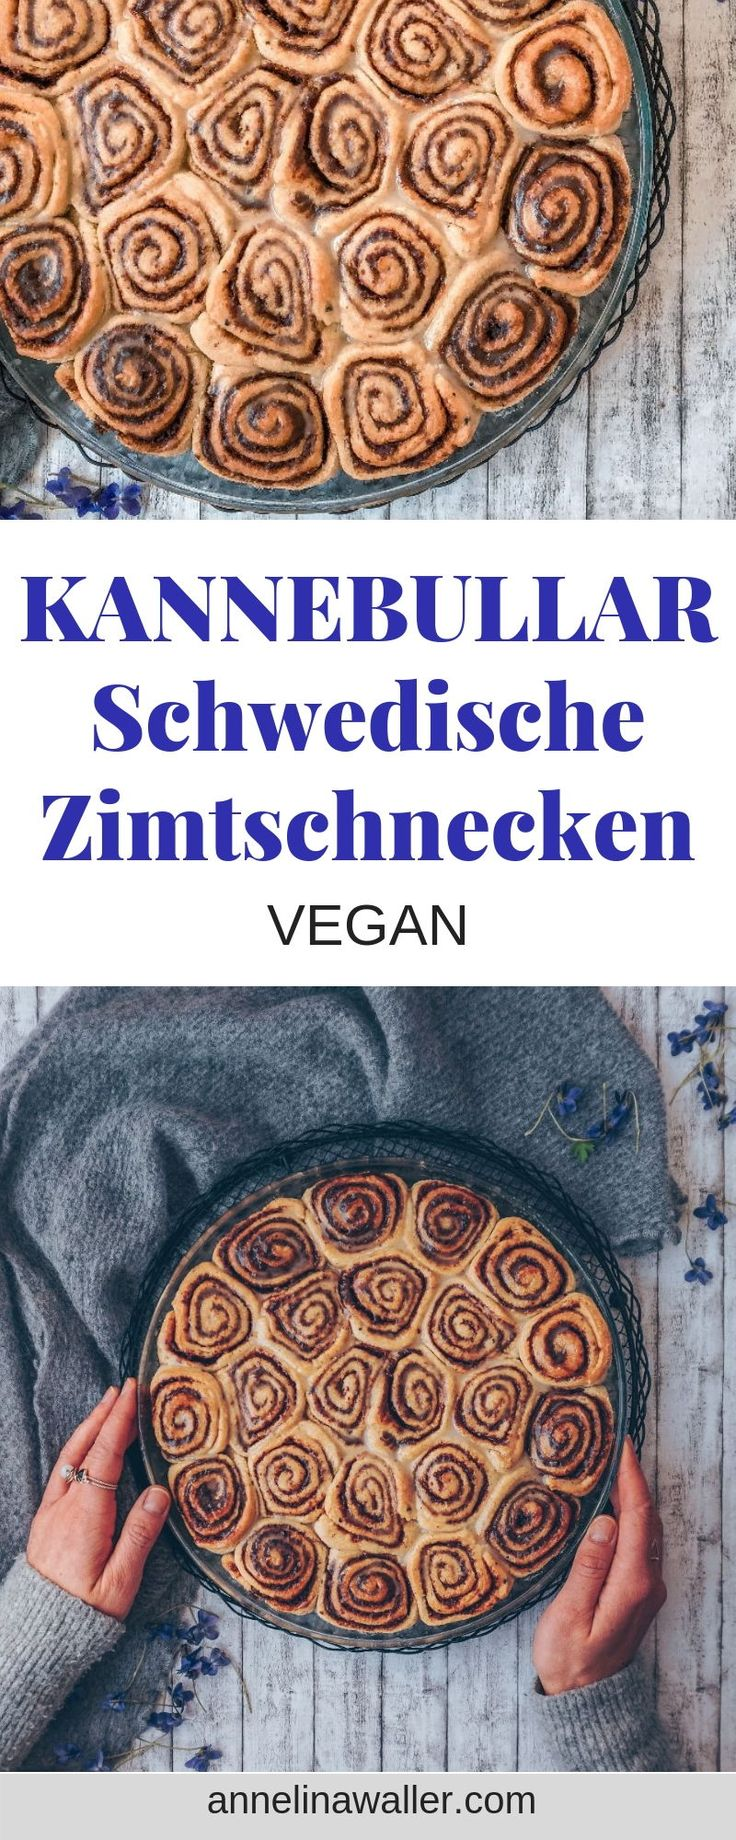 (Kanelbullar) Schwedische Zimtschnecken | vegan